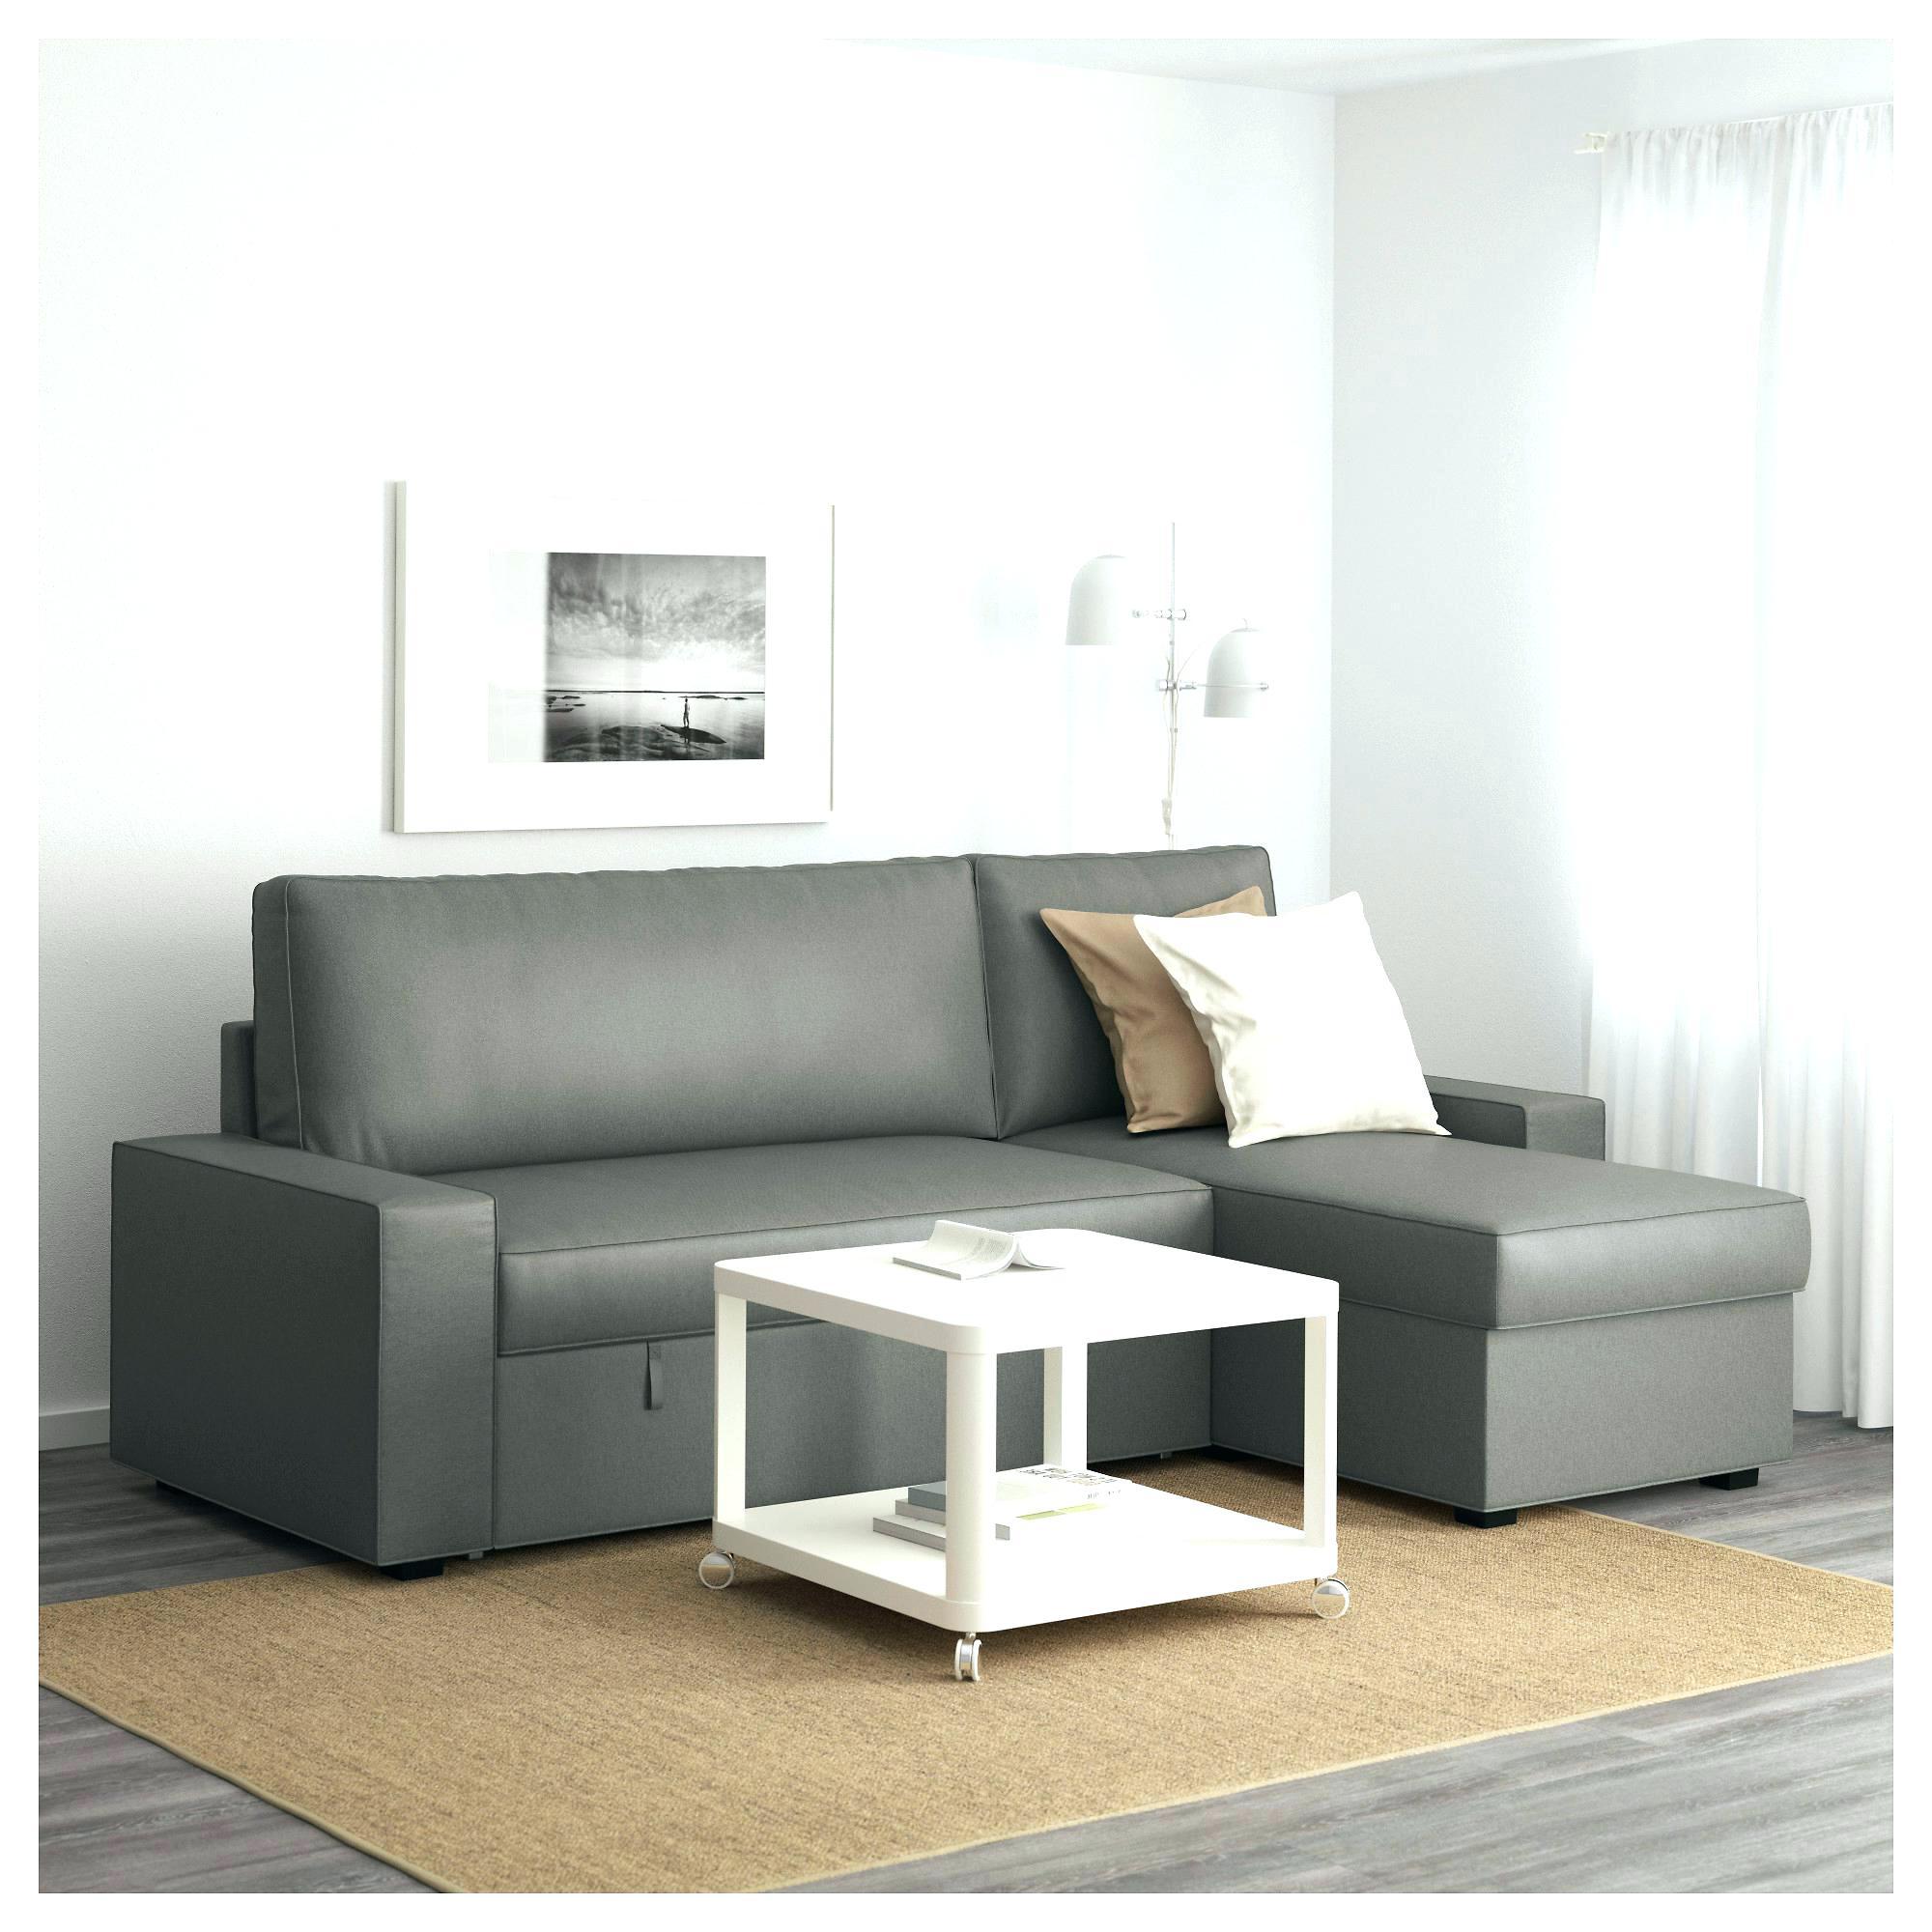 Sofas Baratos Ikea Kvdd Chaiselongue Modern Full Size Of sofasmagnificent Backabro sofa with